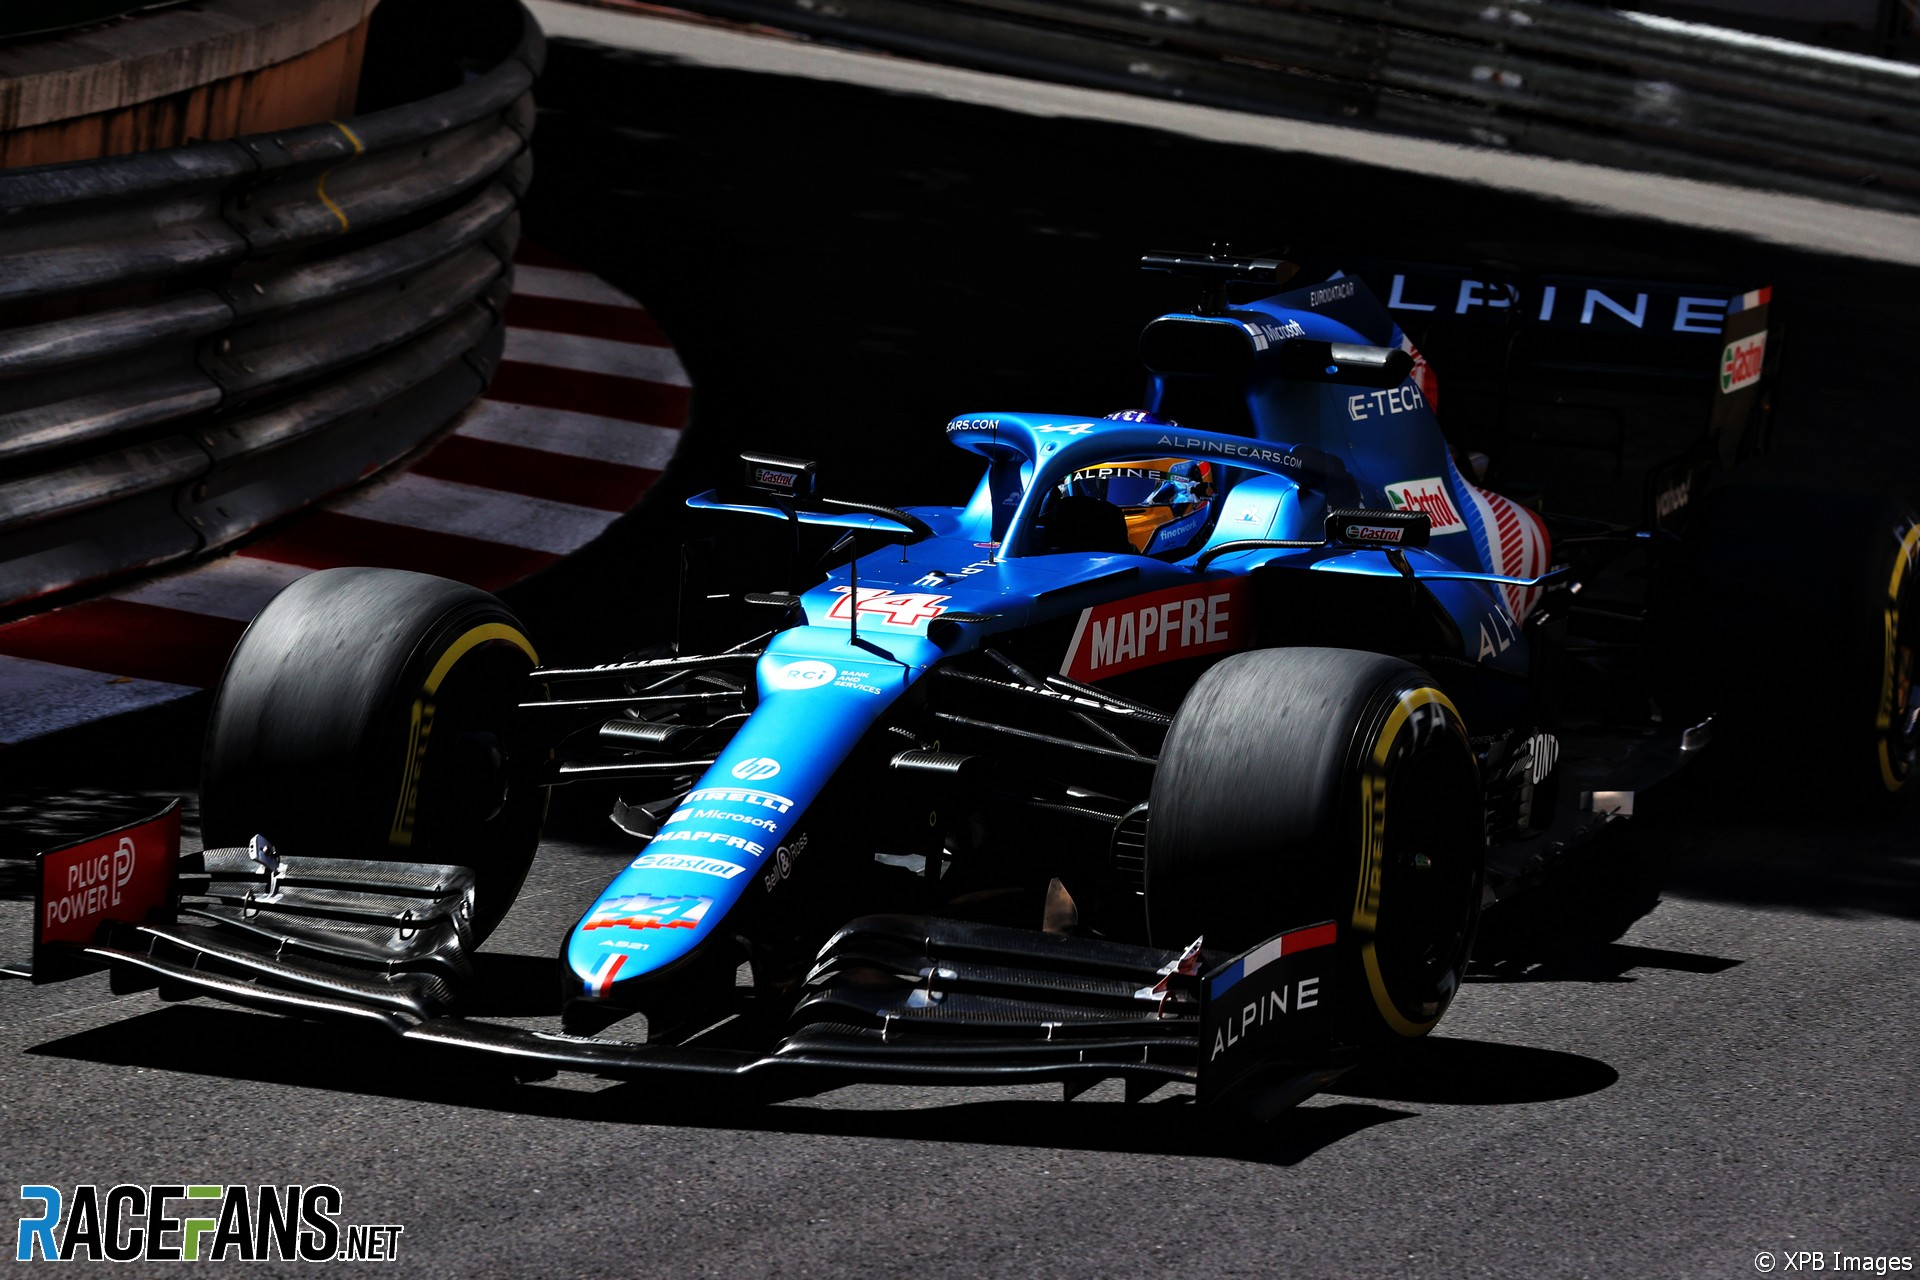 Fernando Alonso, Alpine, Monaco, 2021